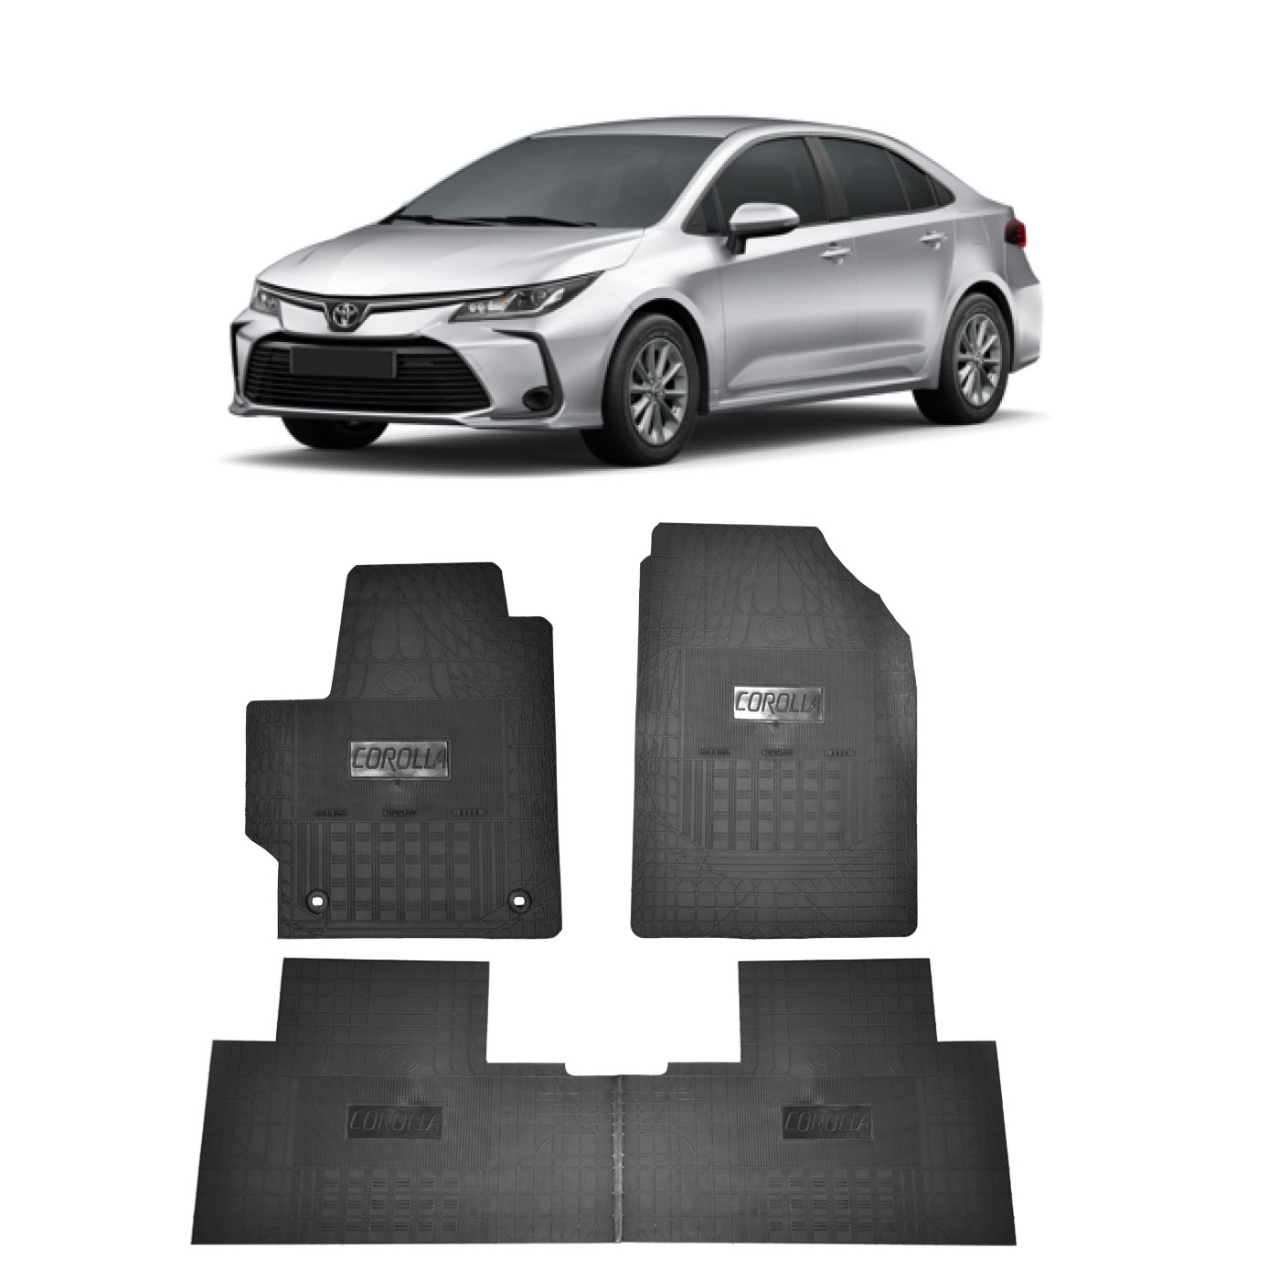 Tapete de Borracha PVC Reforçado Toyota Corolla Tapeplass